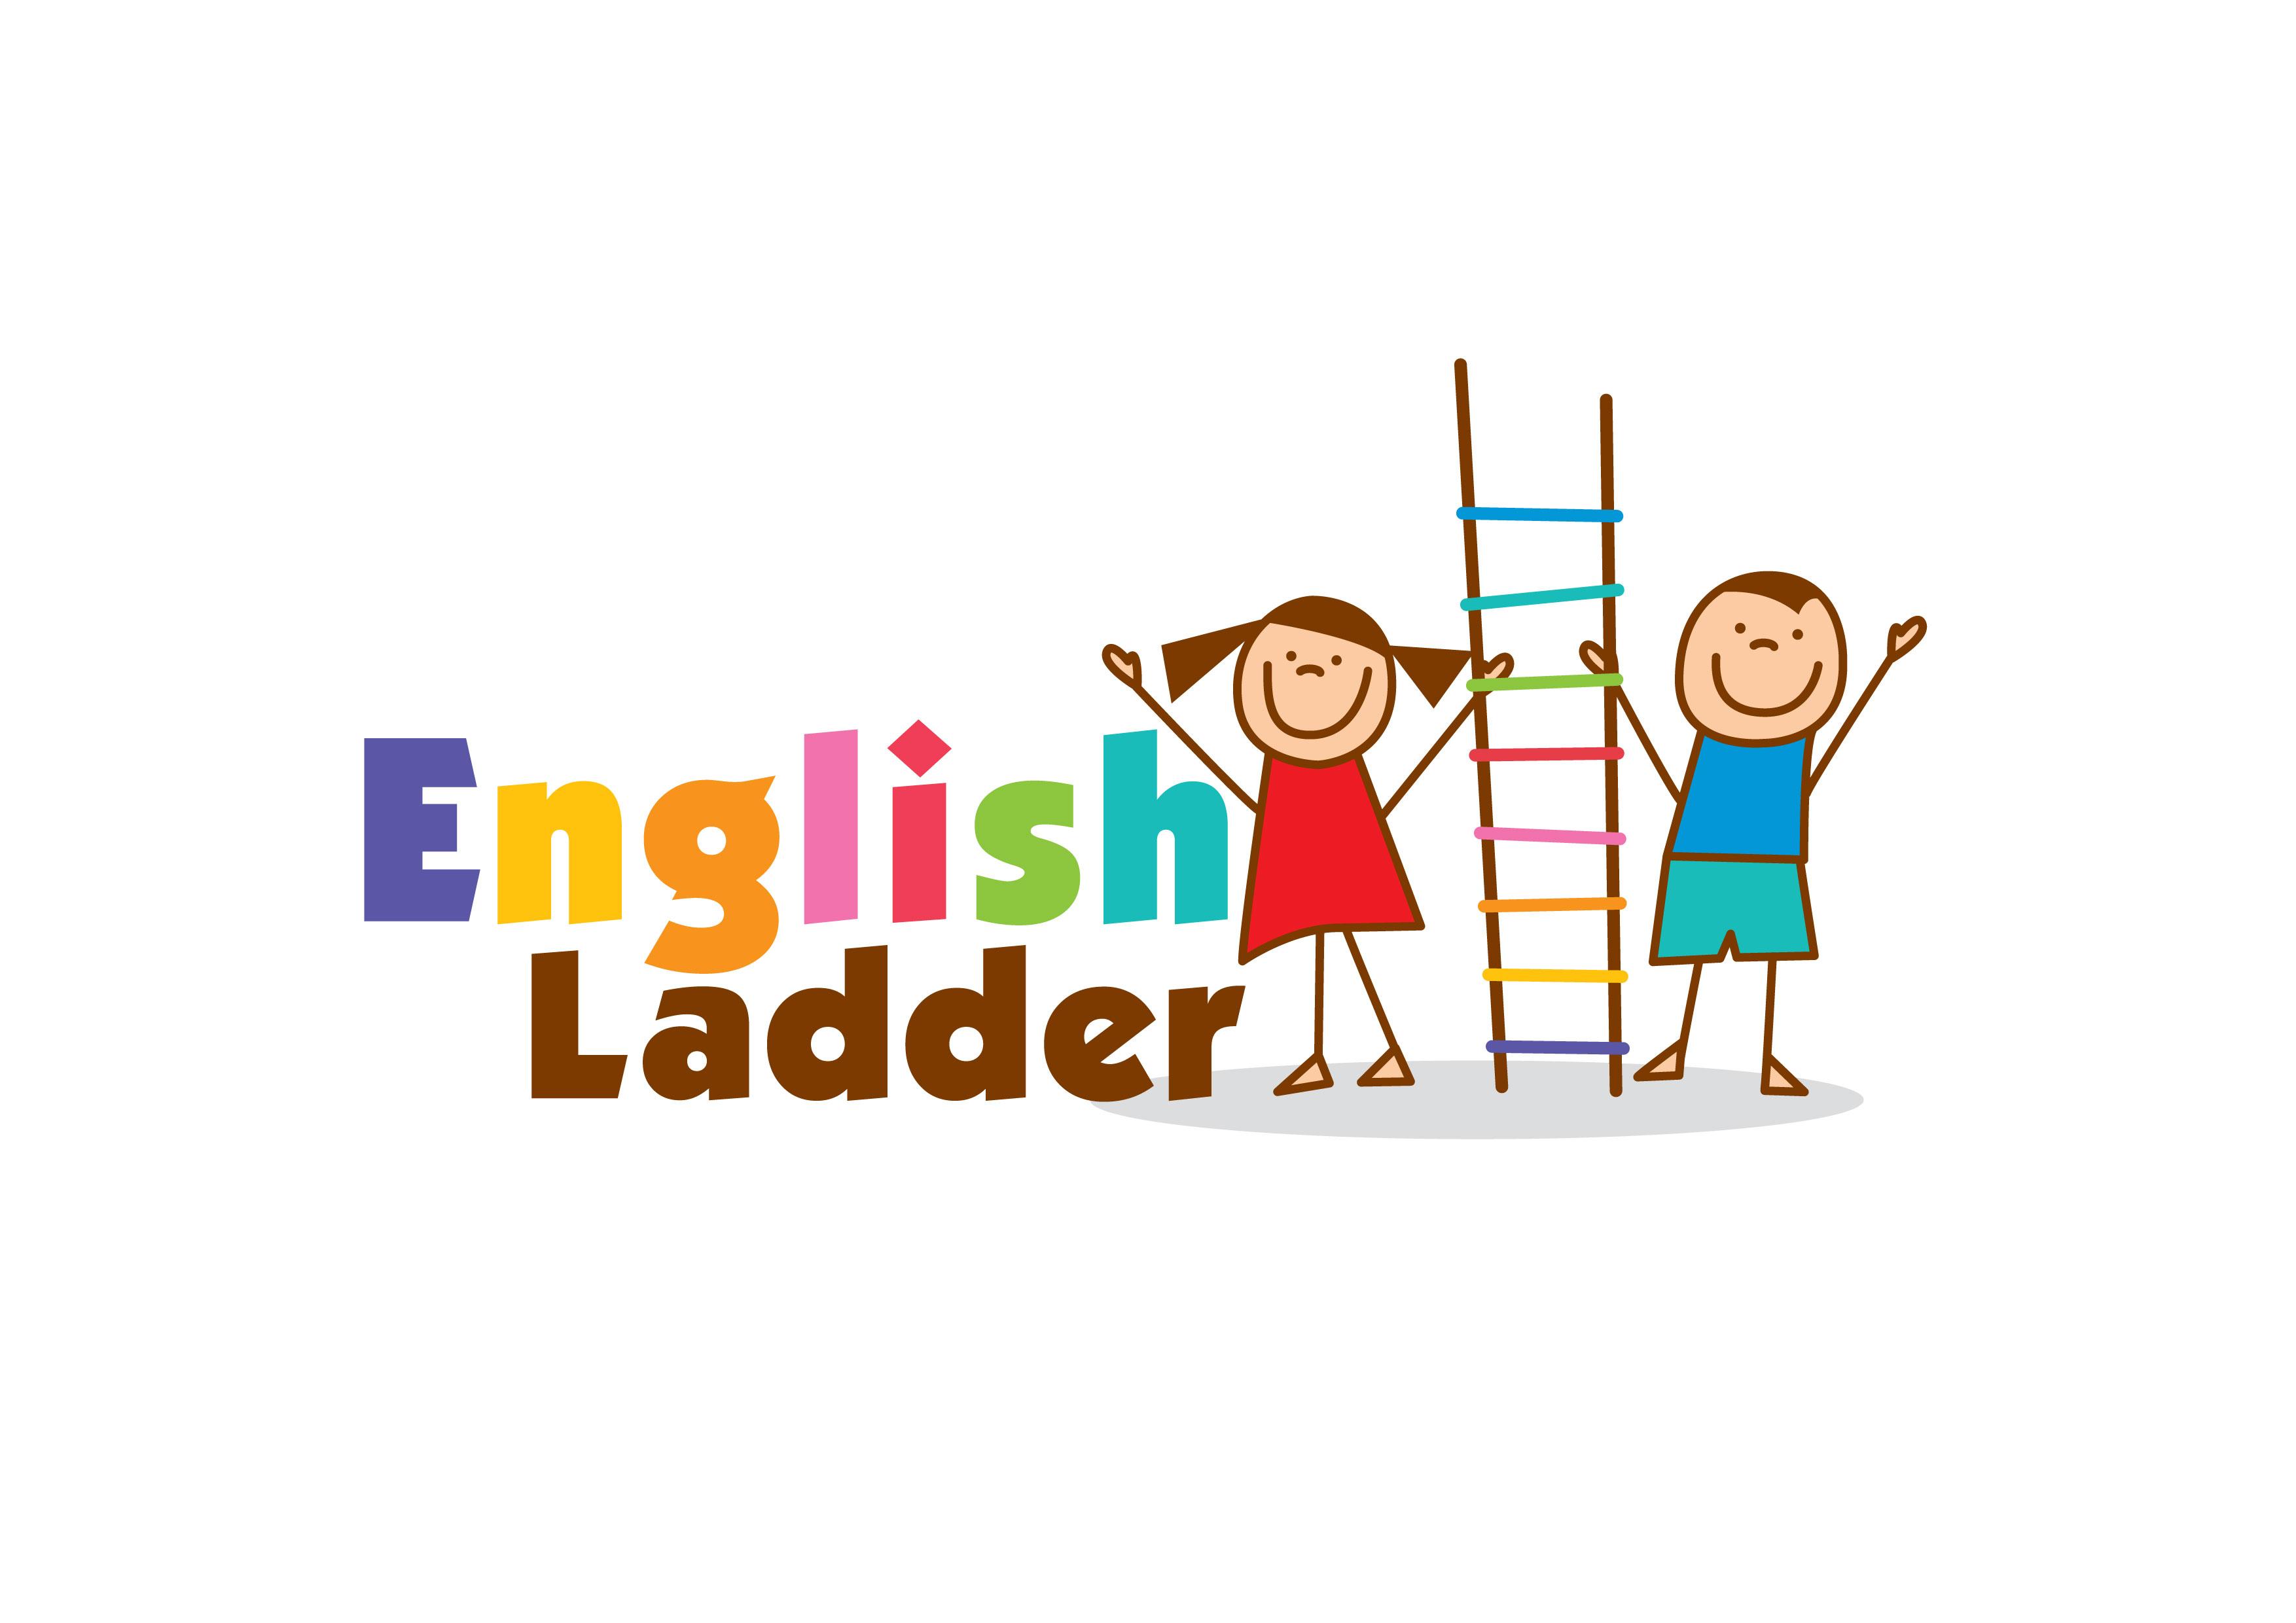 English Ladder